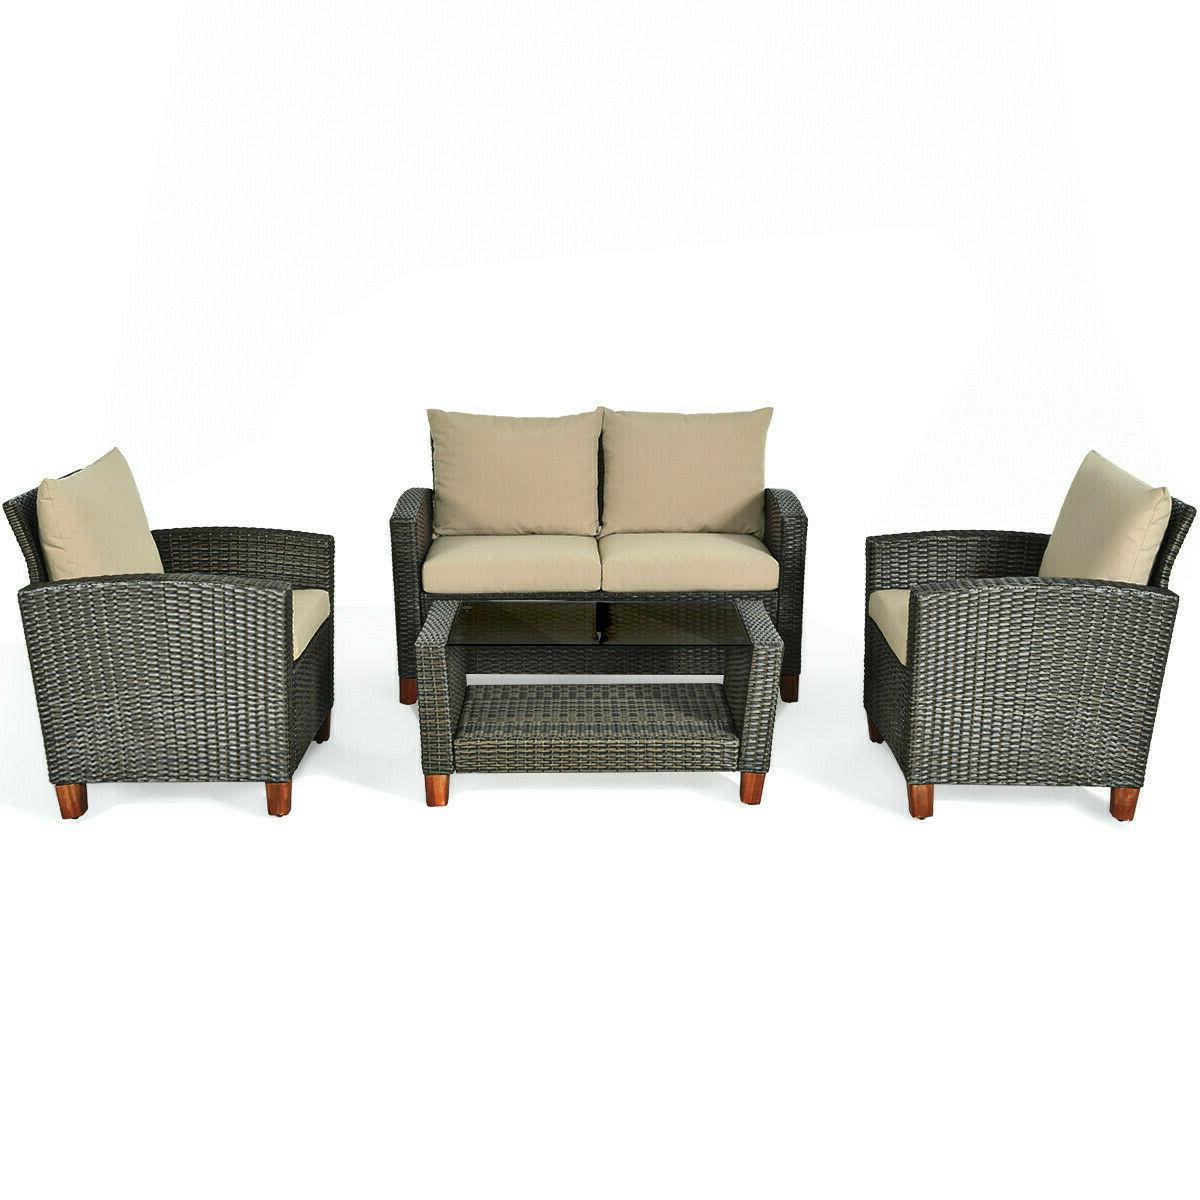 Outdoor Furniture Set 4-PCS Patio Rattan Wicker Table Cushio